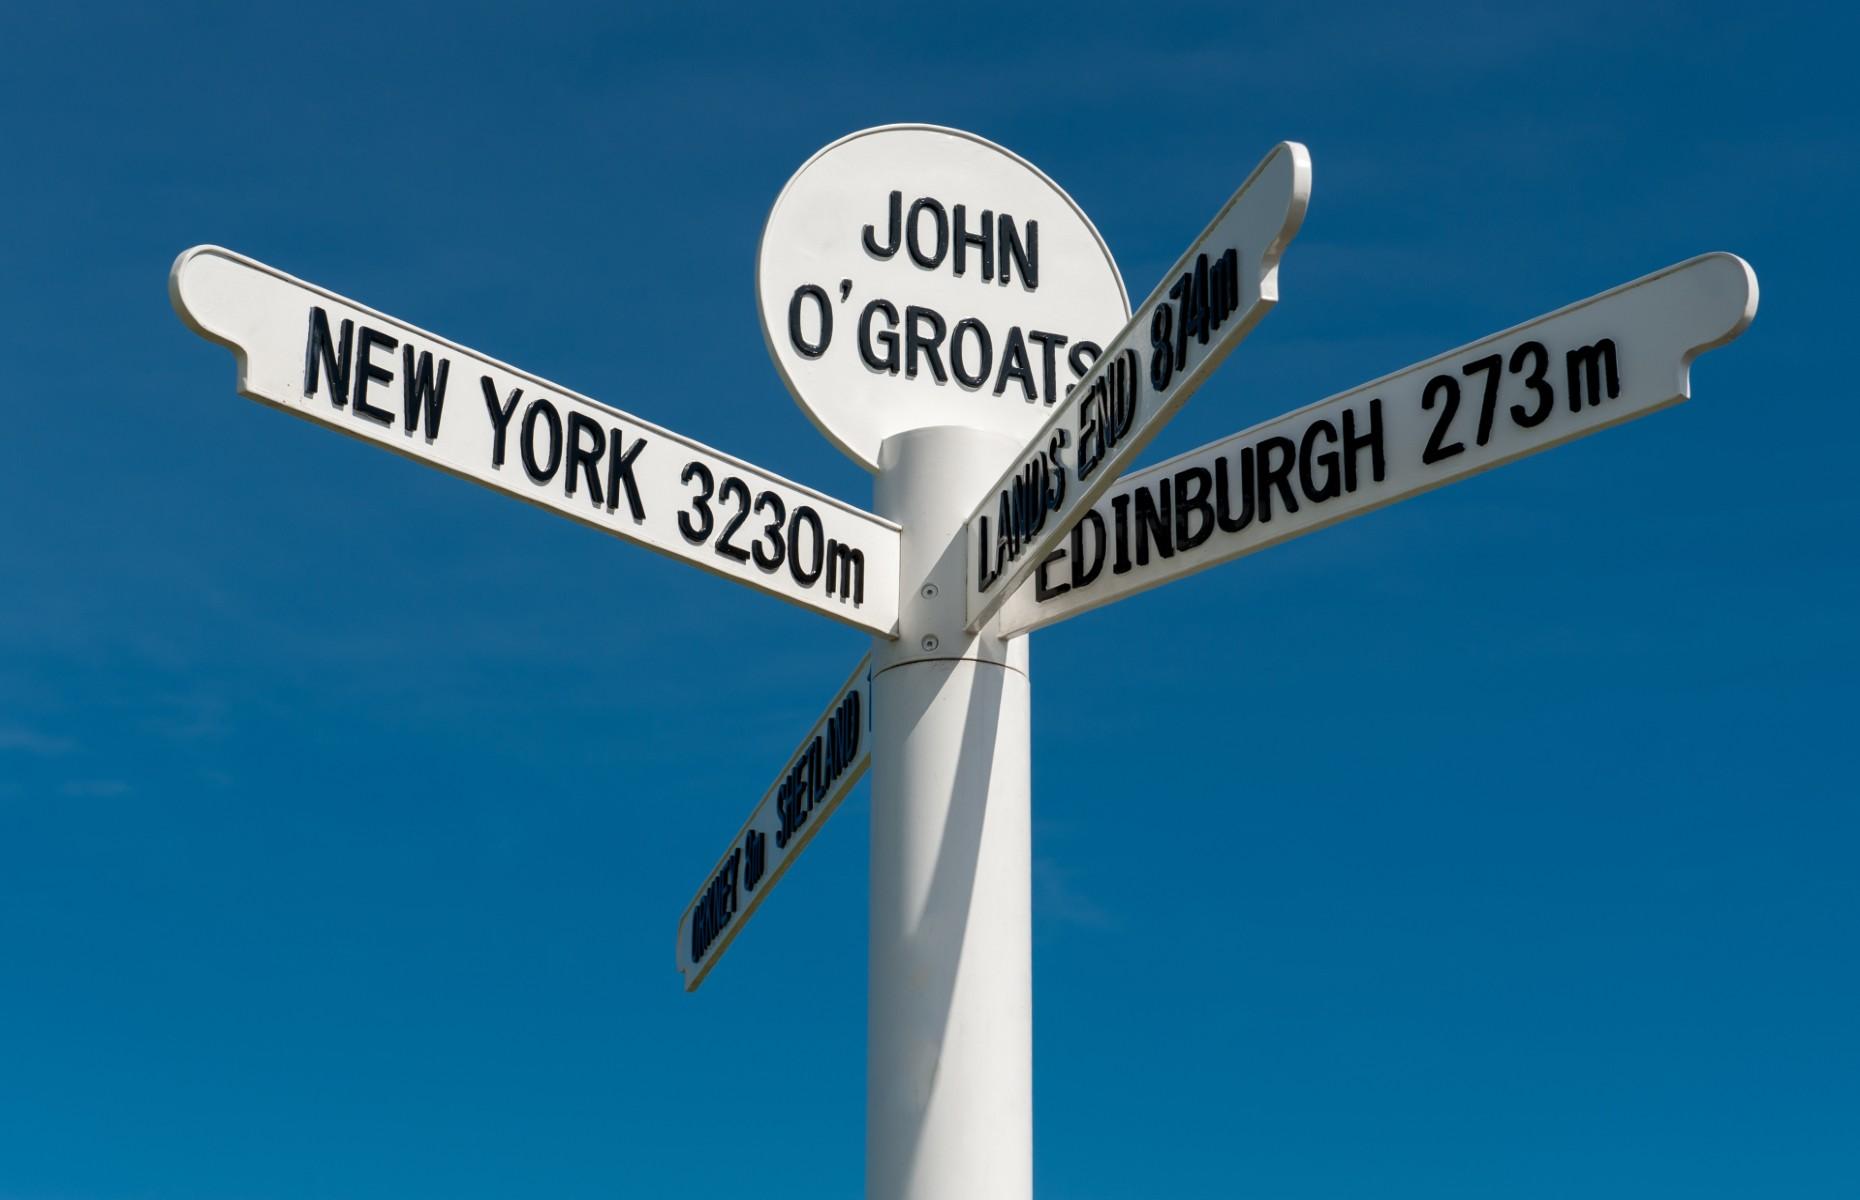 John O'Groats signpost (Image: mountaintreks/Shutterstock)